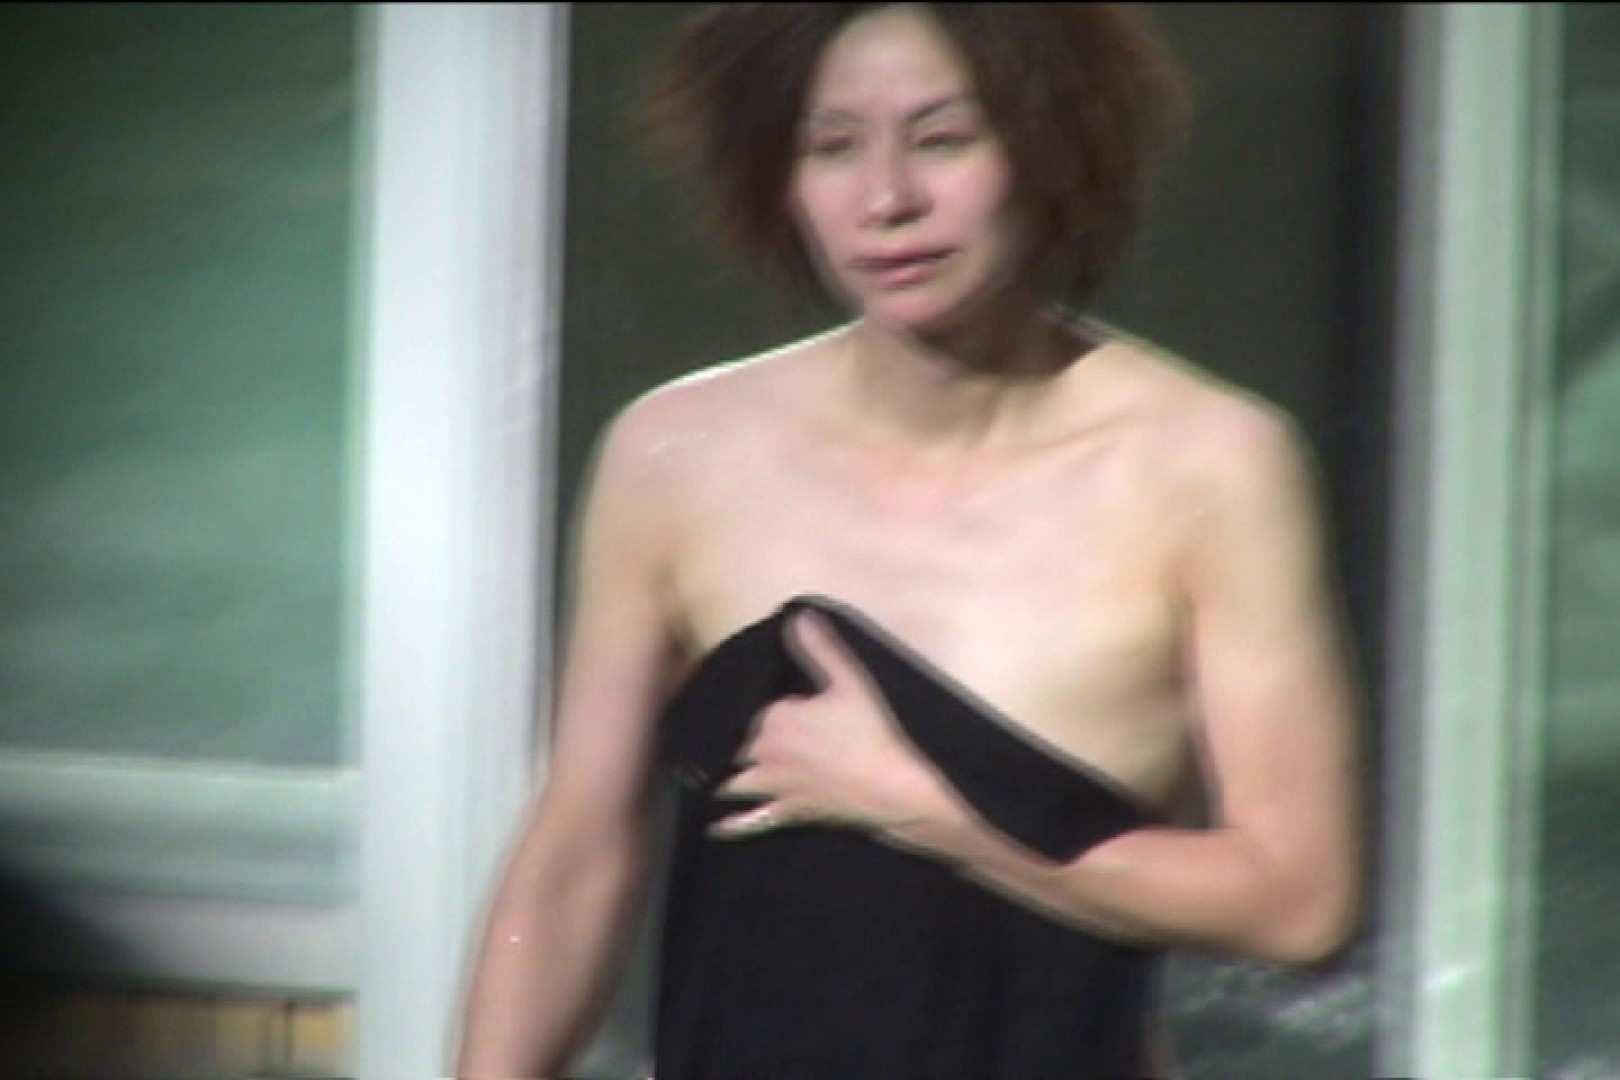 Aquaな露天風呂Vol.450 盗撮大放出 盗み撮り動画 92連発 79